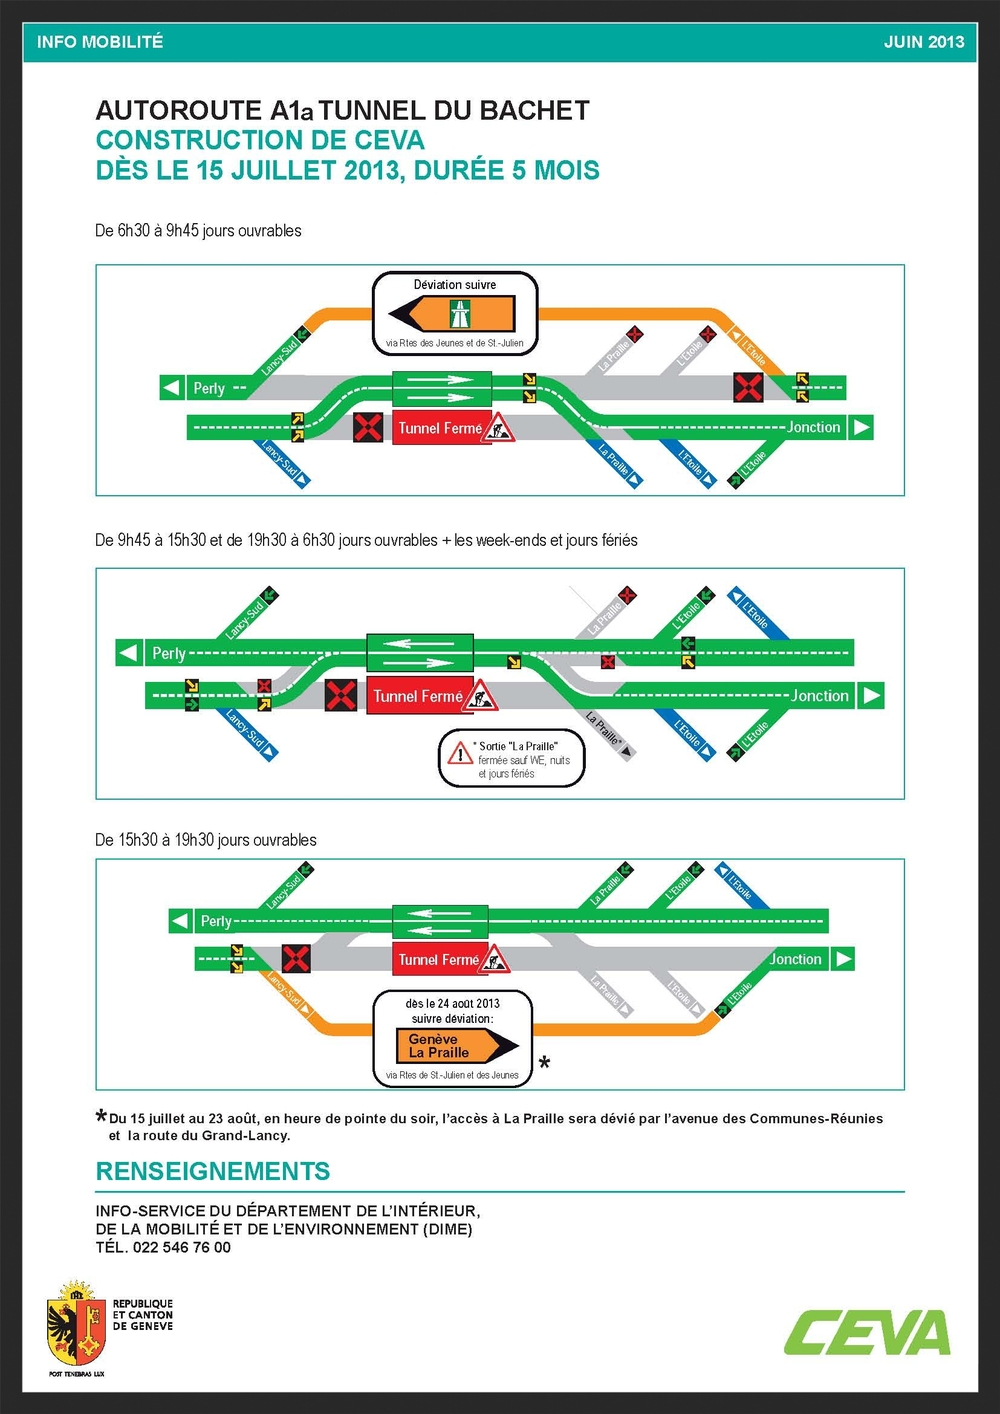 2013.06.26 Fiche Info Mobilite CEVA Bachet Autoroute A1aPage_2.jpg